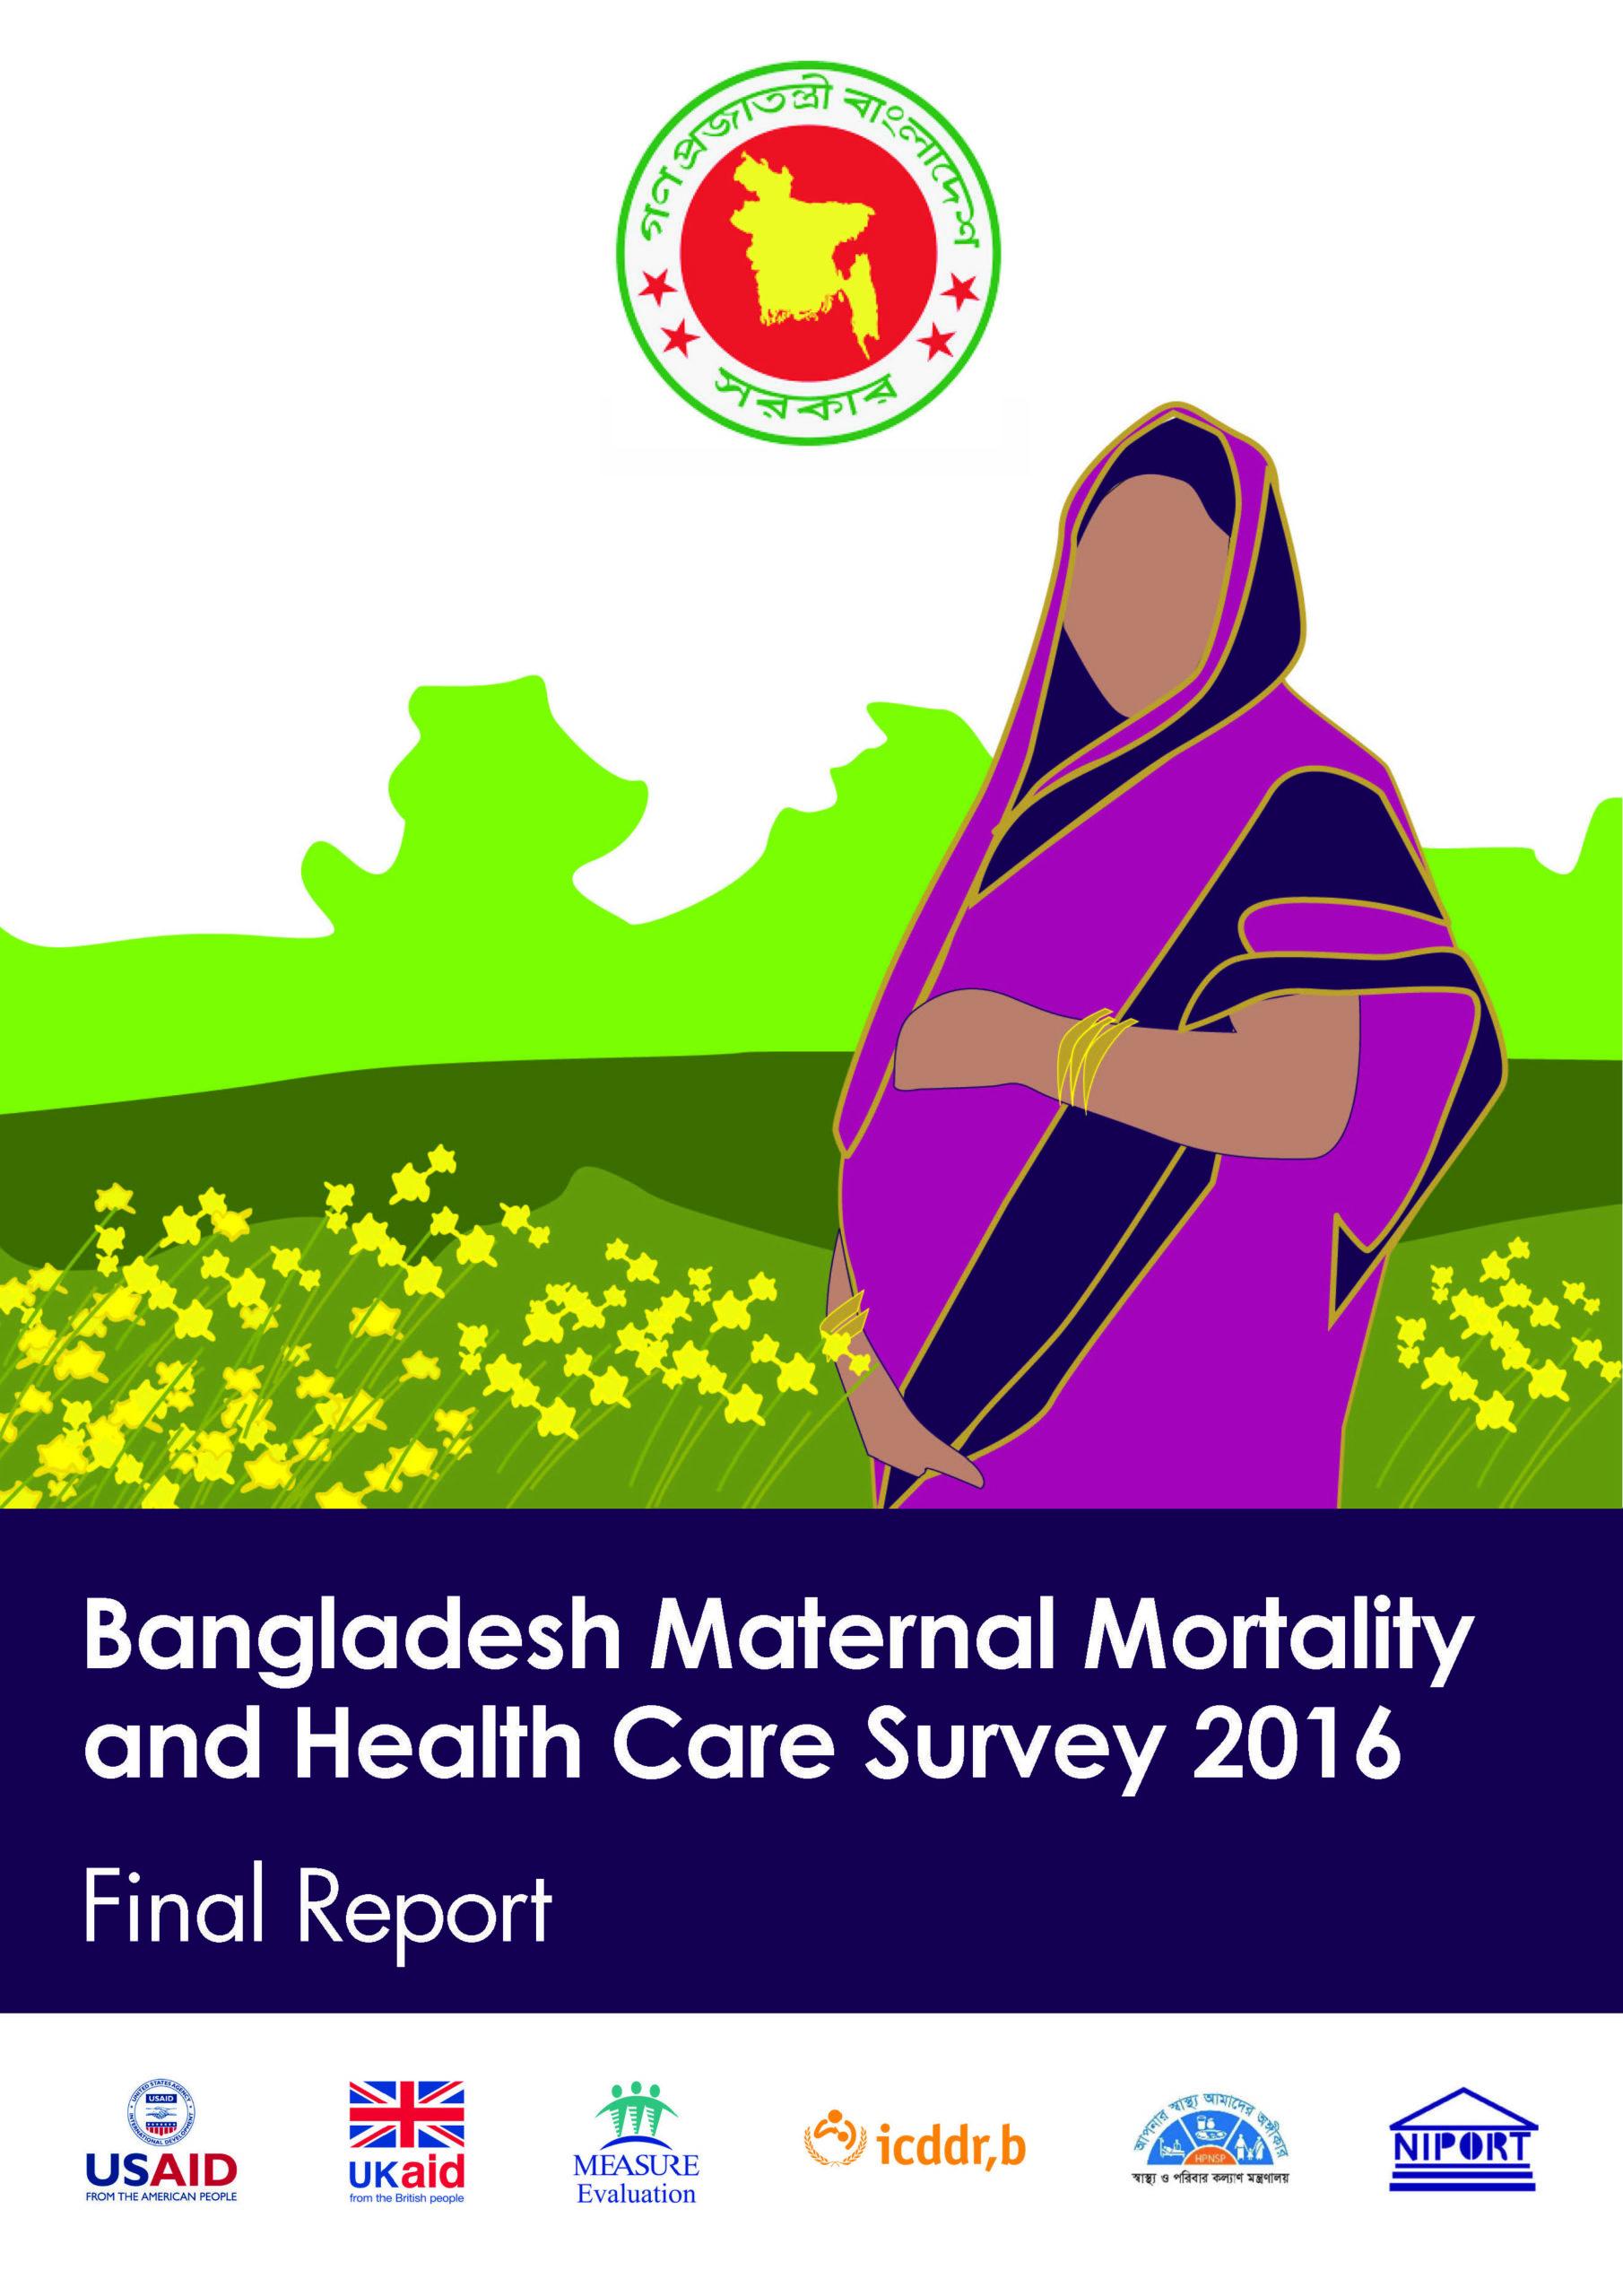 Bangladesh Maternal Mortality and Health Care Survey (BMMS) 2016: Final Report